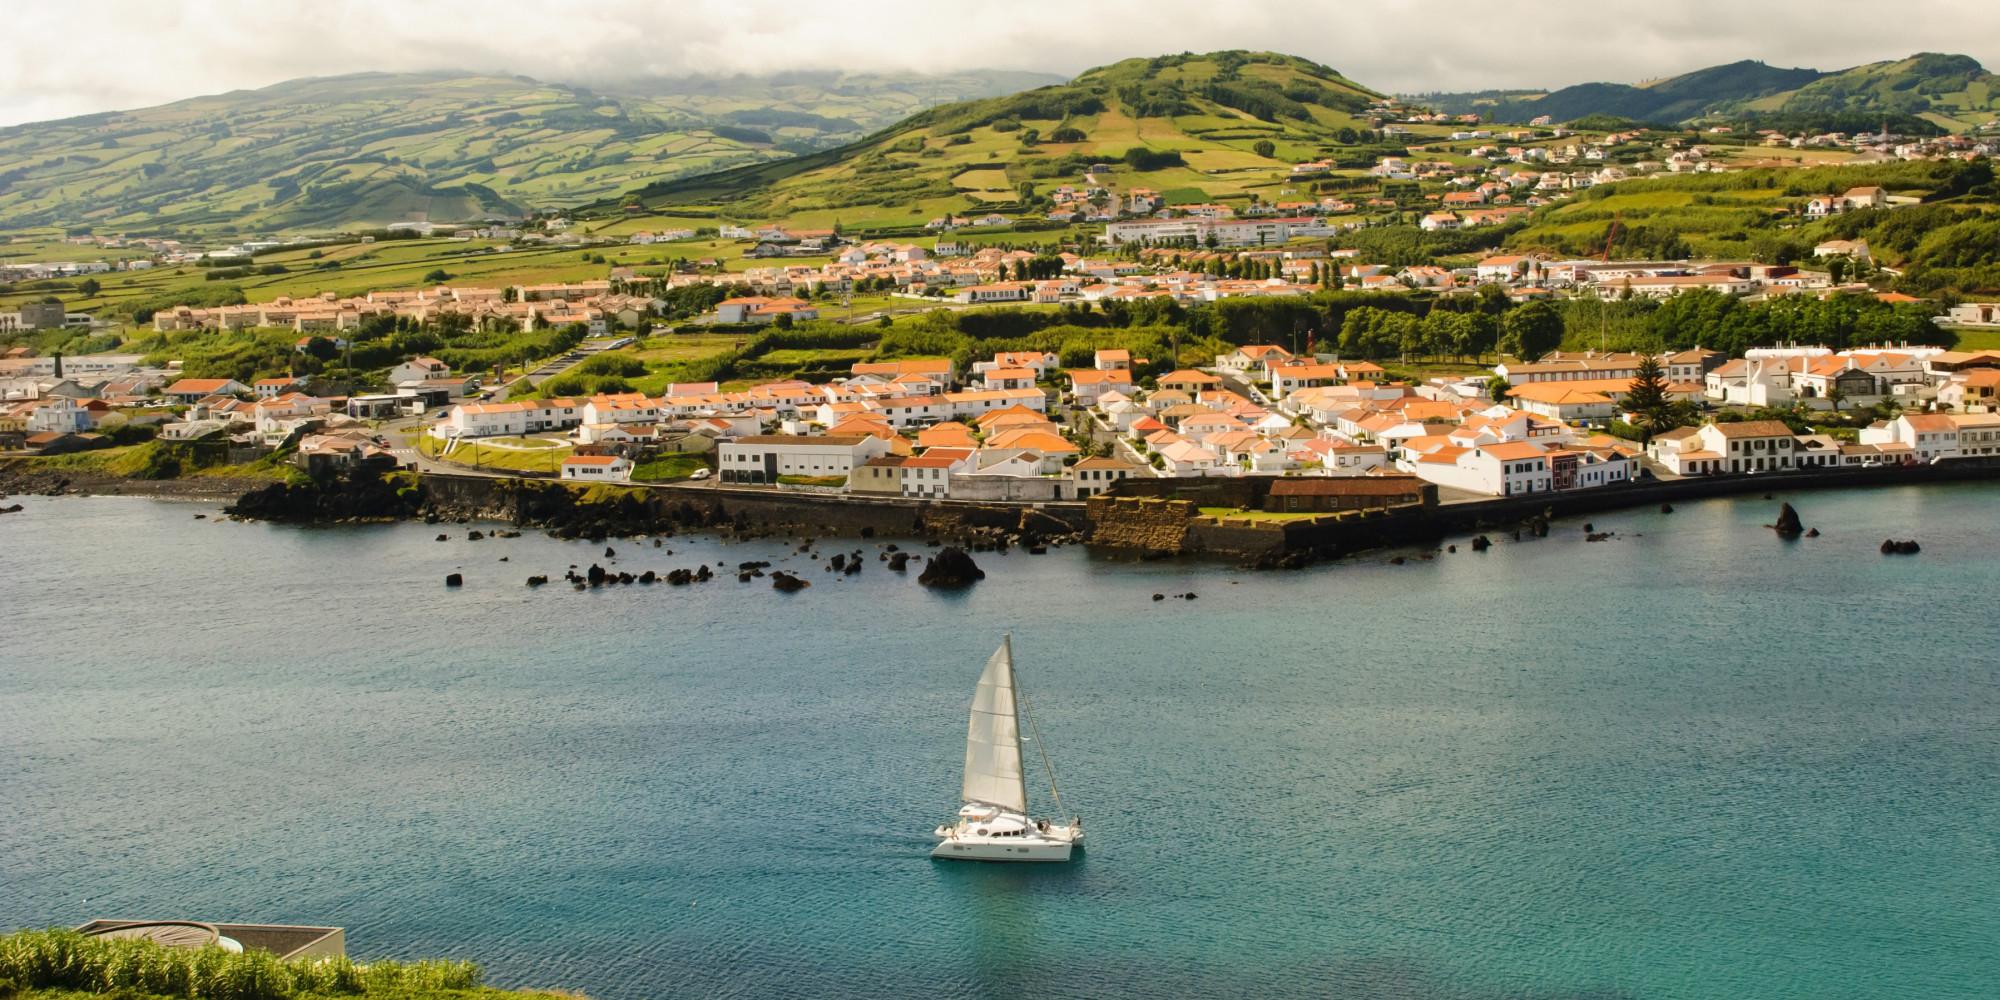 Portugal Island Tore